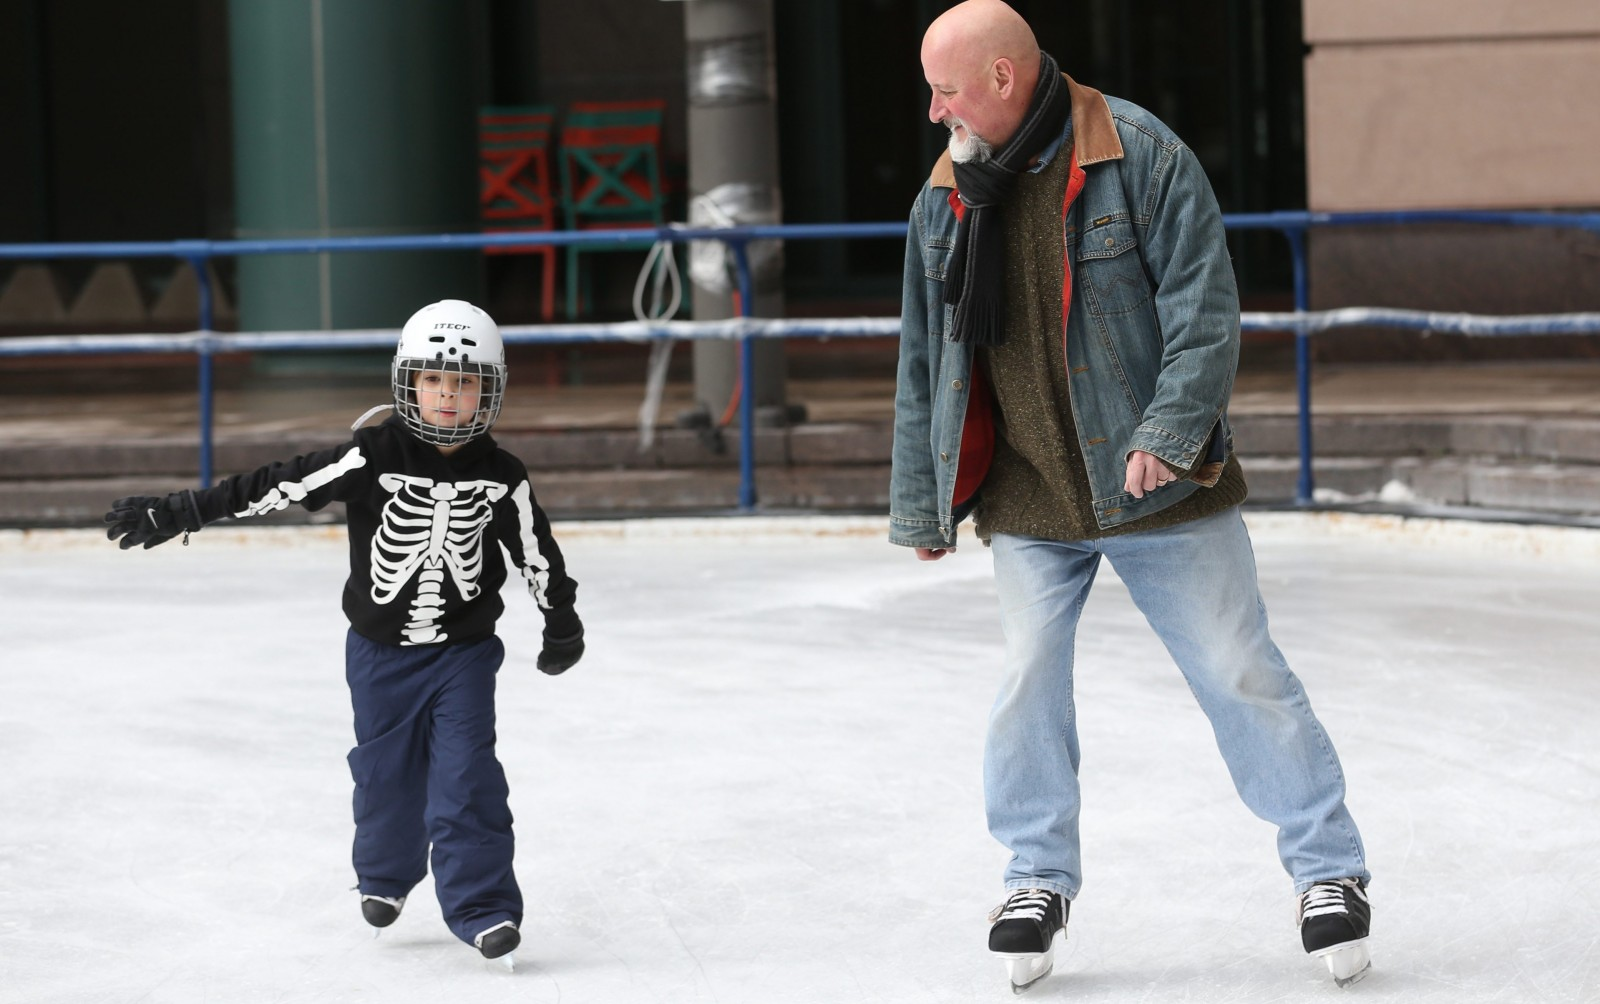 Jim Mezon of Niagara-On-The-Lake skates with his son Eli, 6, at Rotary Rink. (Sharon Cantillon/Buffalo News)